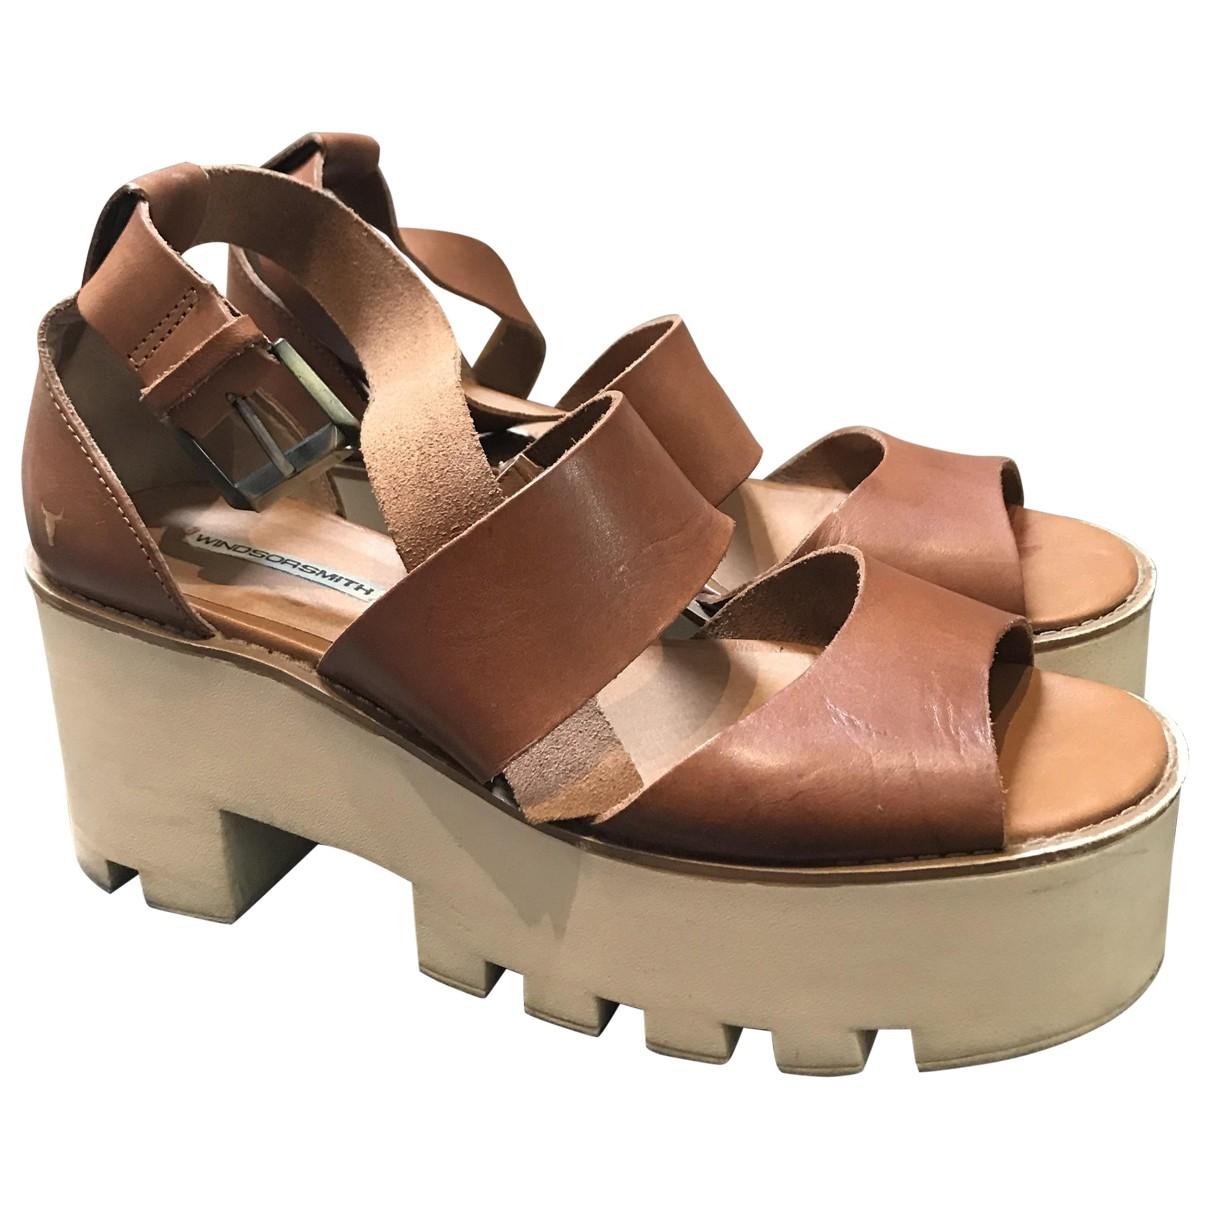 Windsor Smith - Sandales   pour femme en cuir - camel